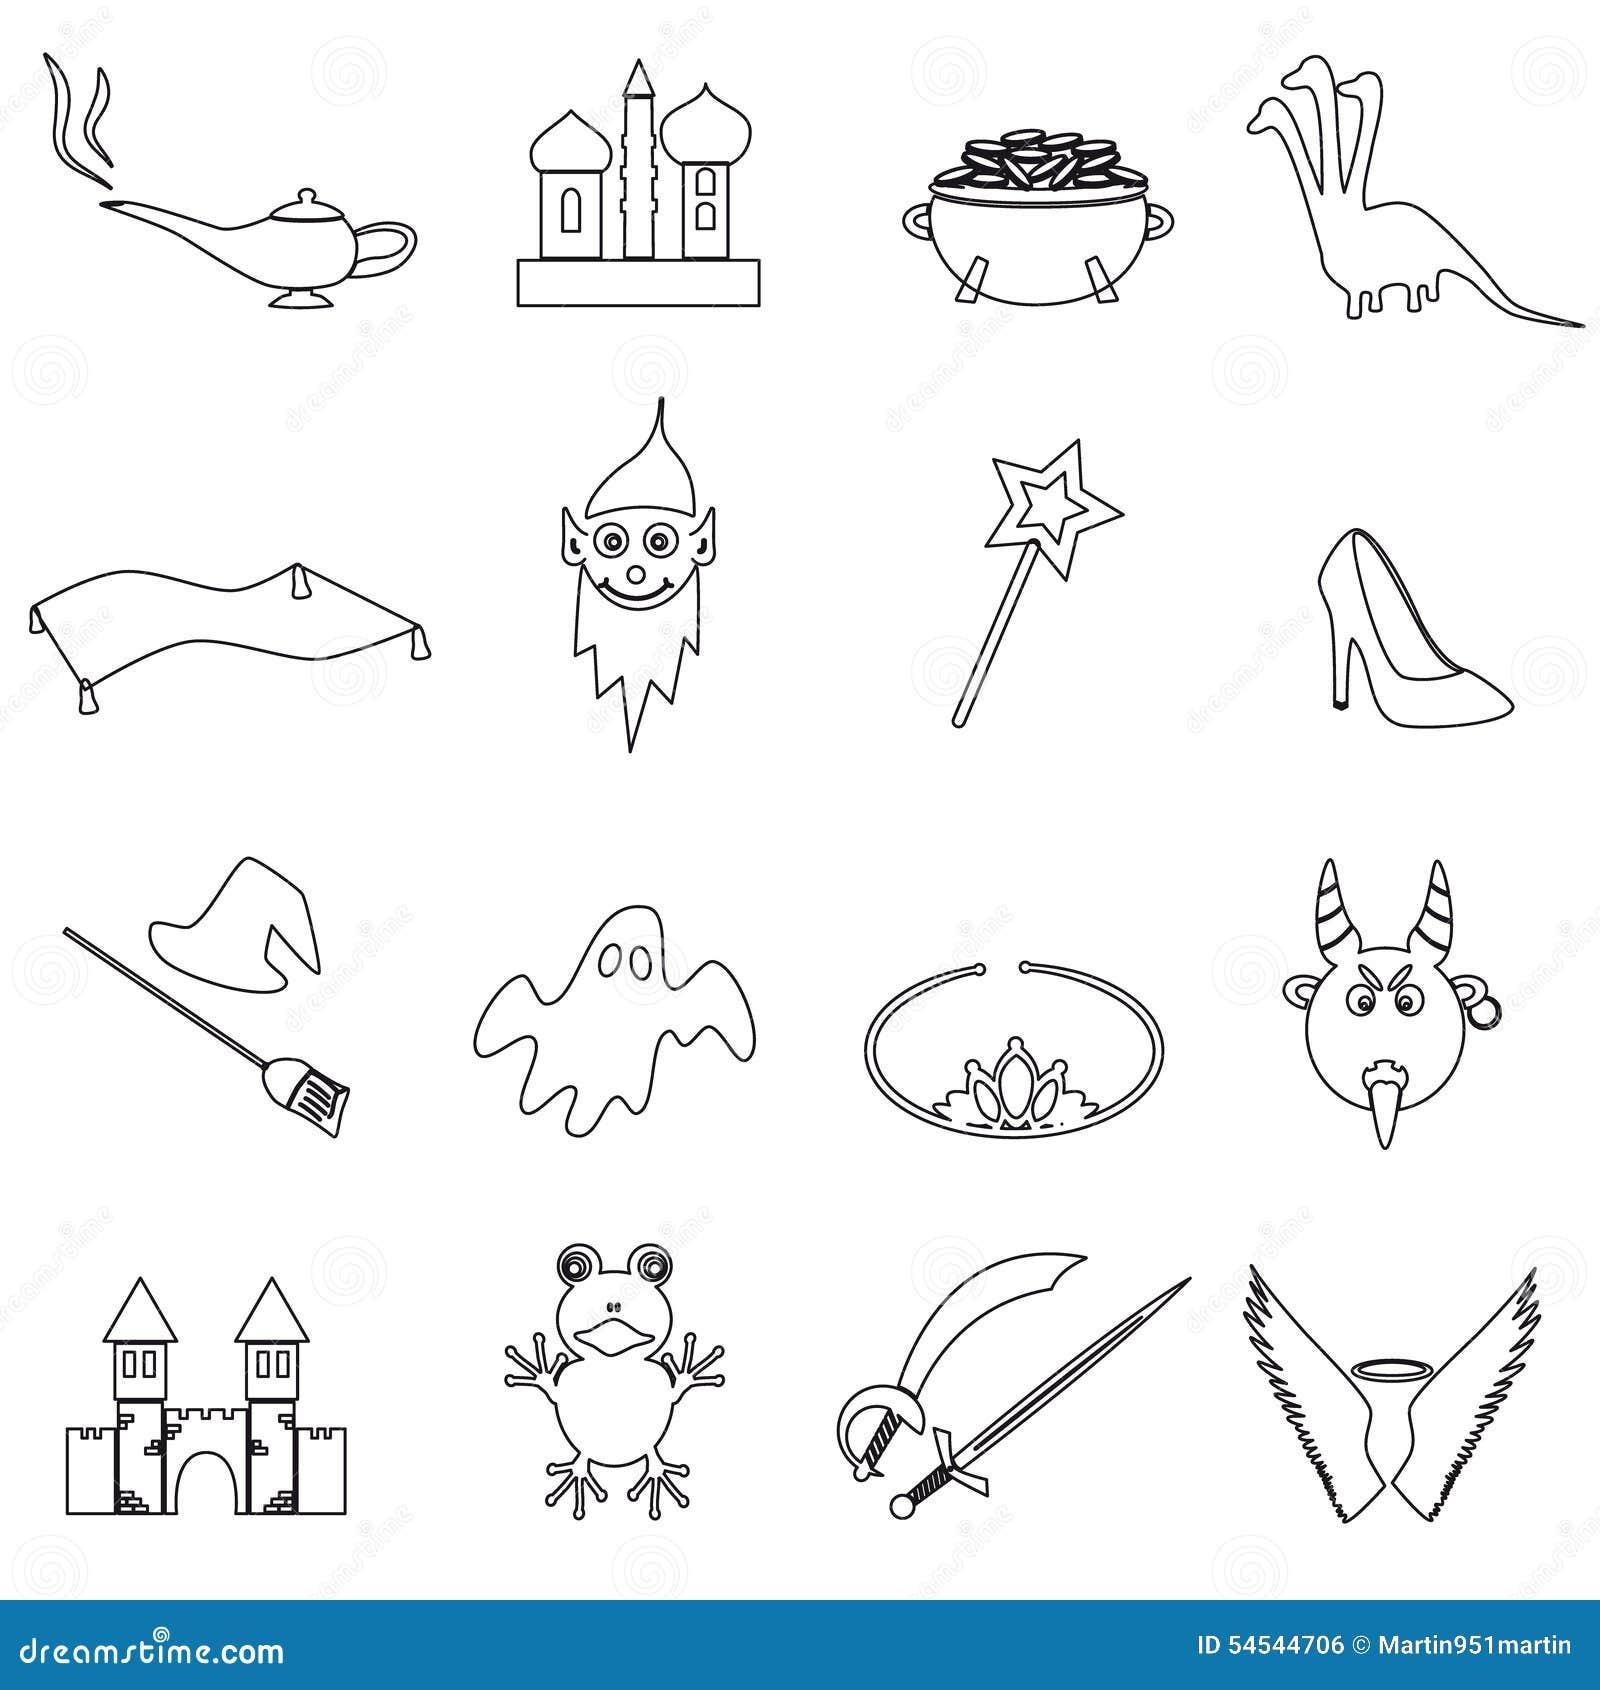 frog king outline illustration stock photography image 7274442